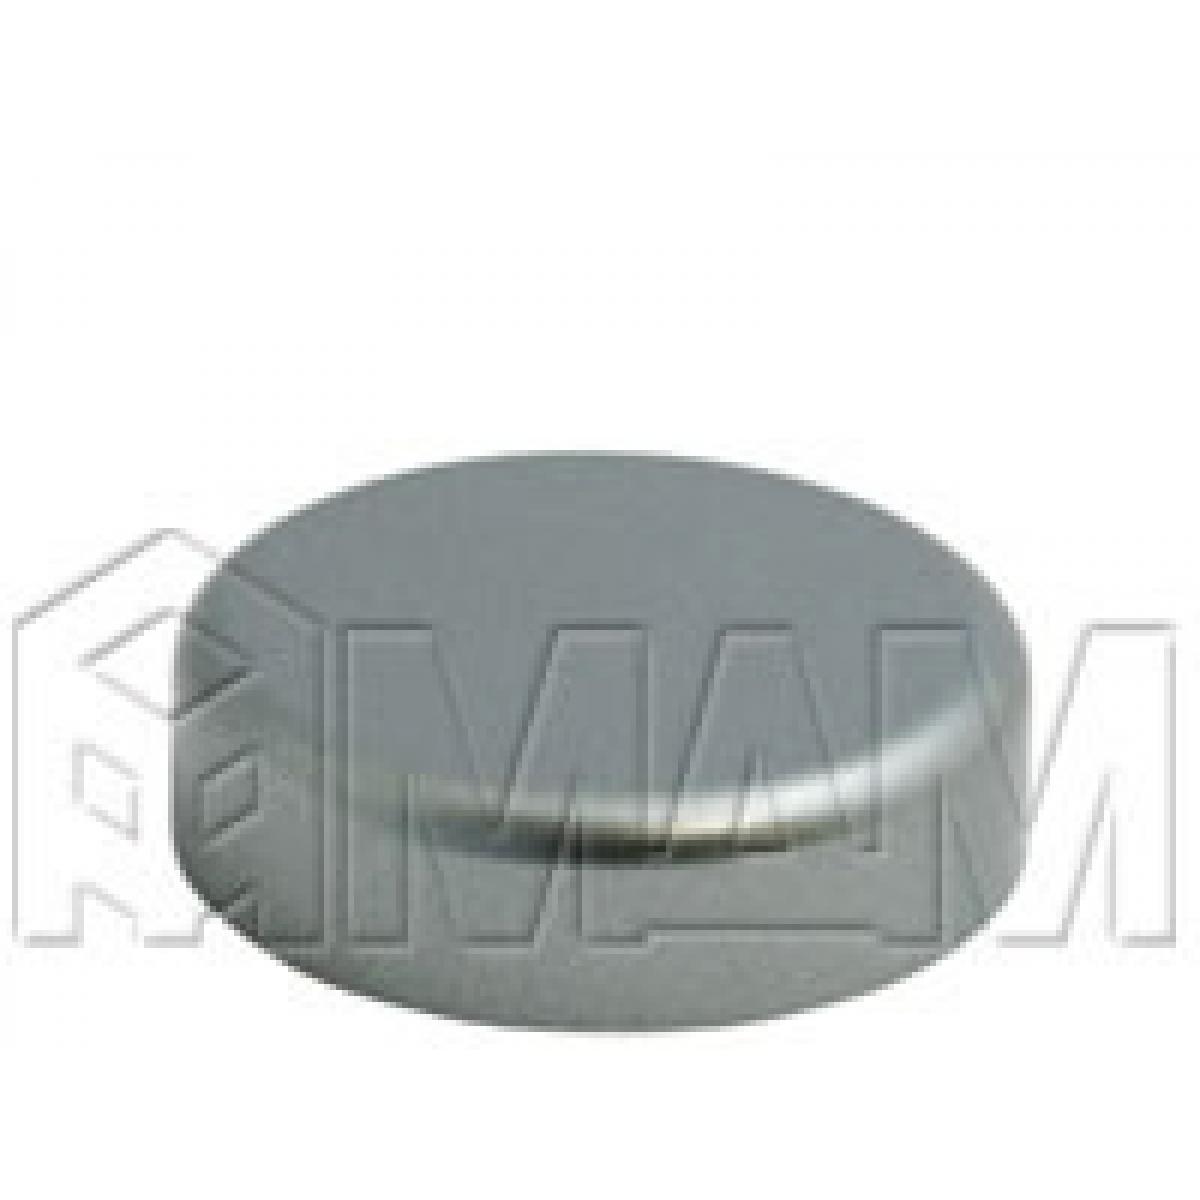 Петли Стеко/Зеркало - Заглушка декоративная Mini 12 круглая, хром матовый